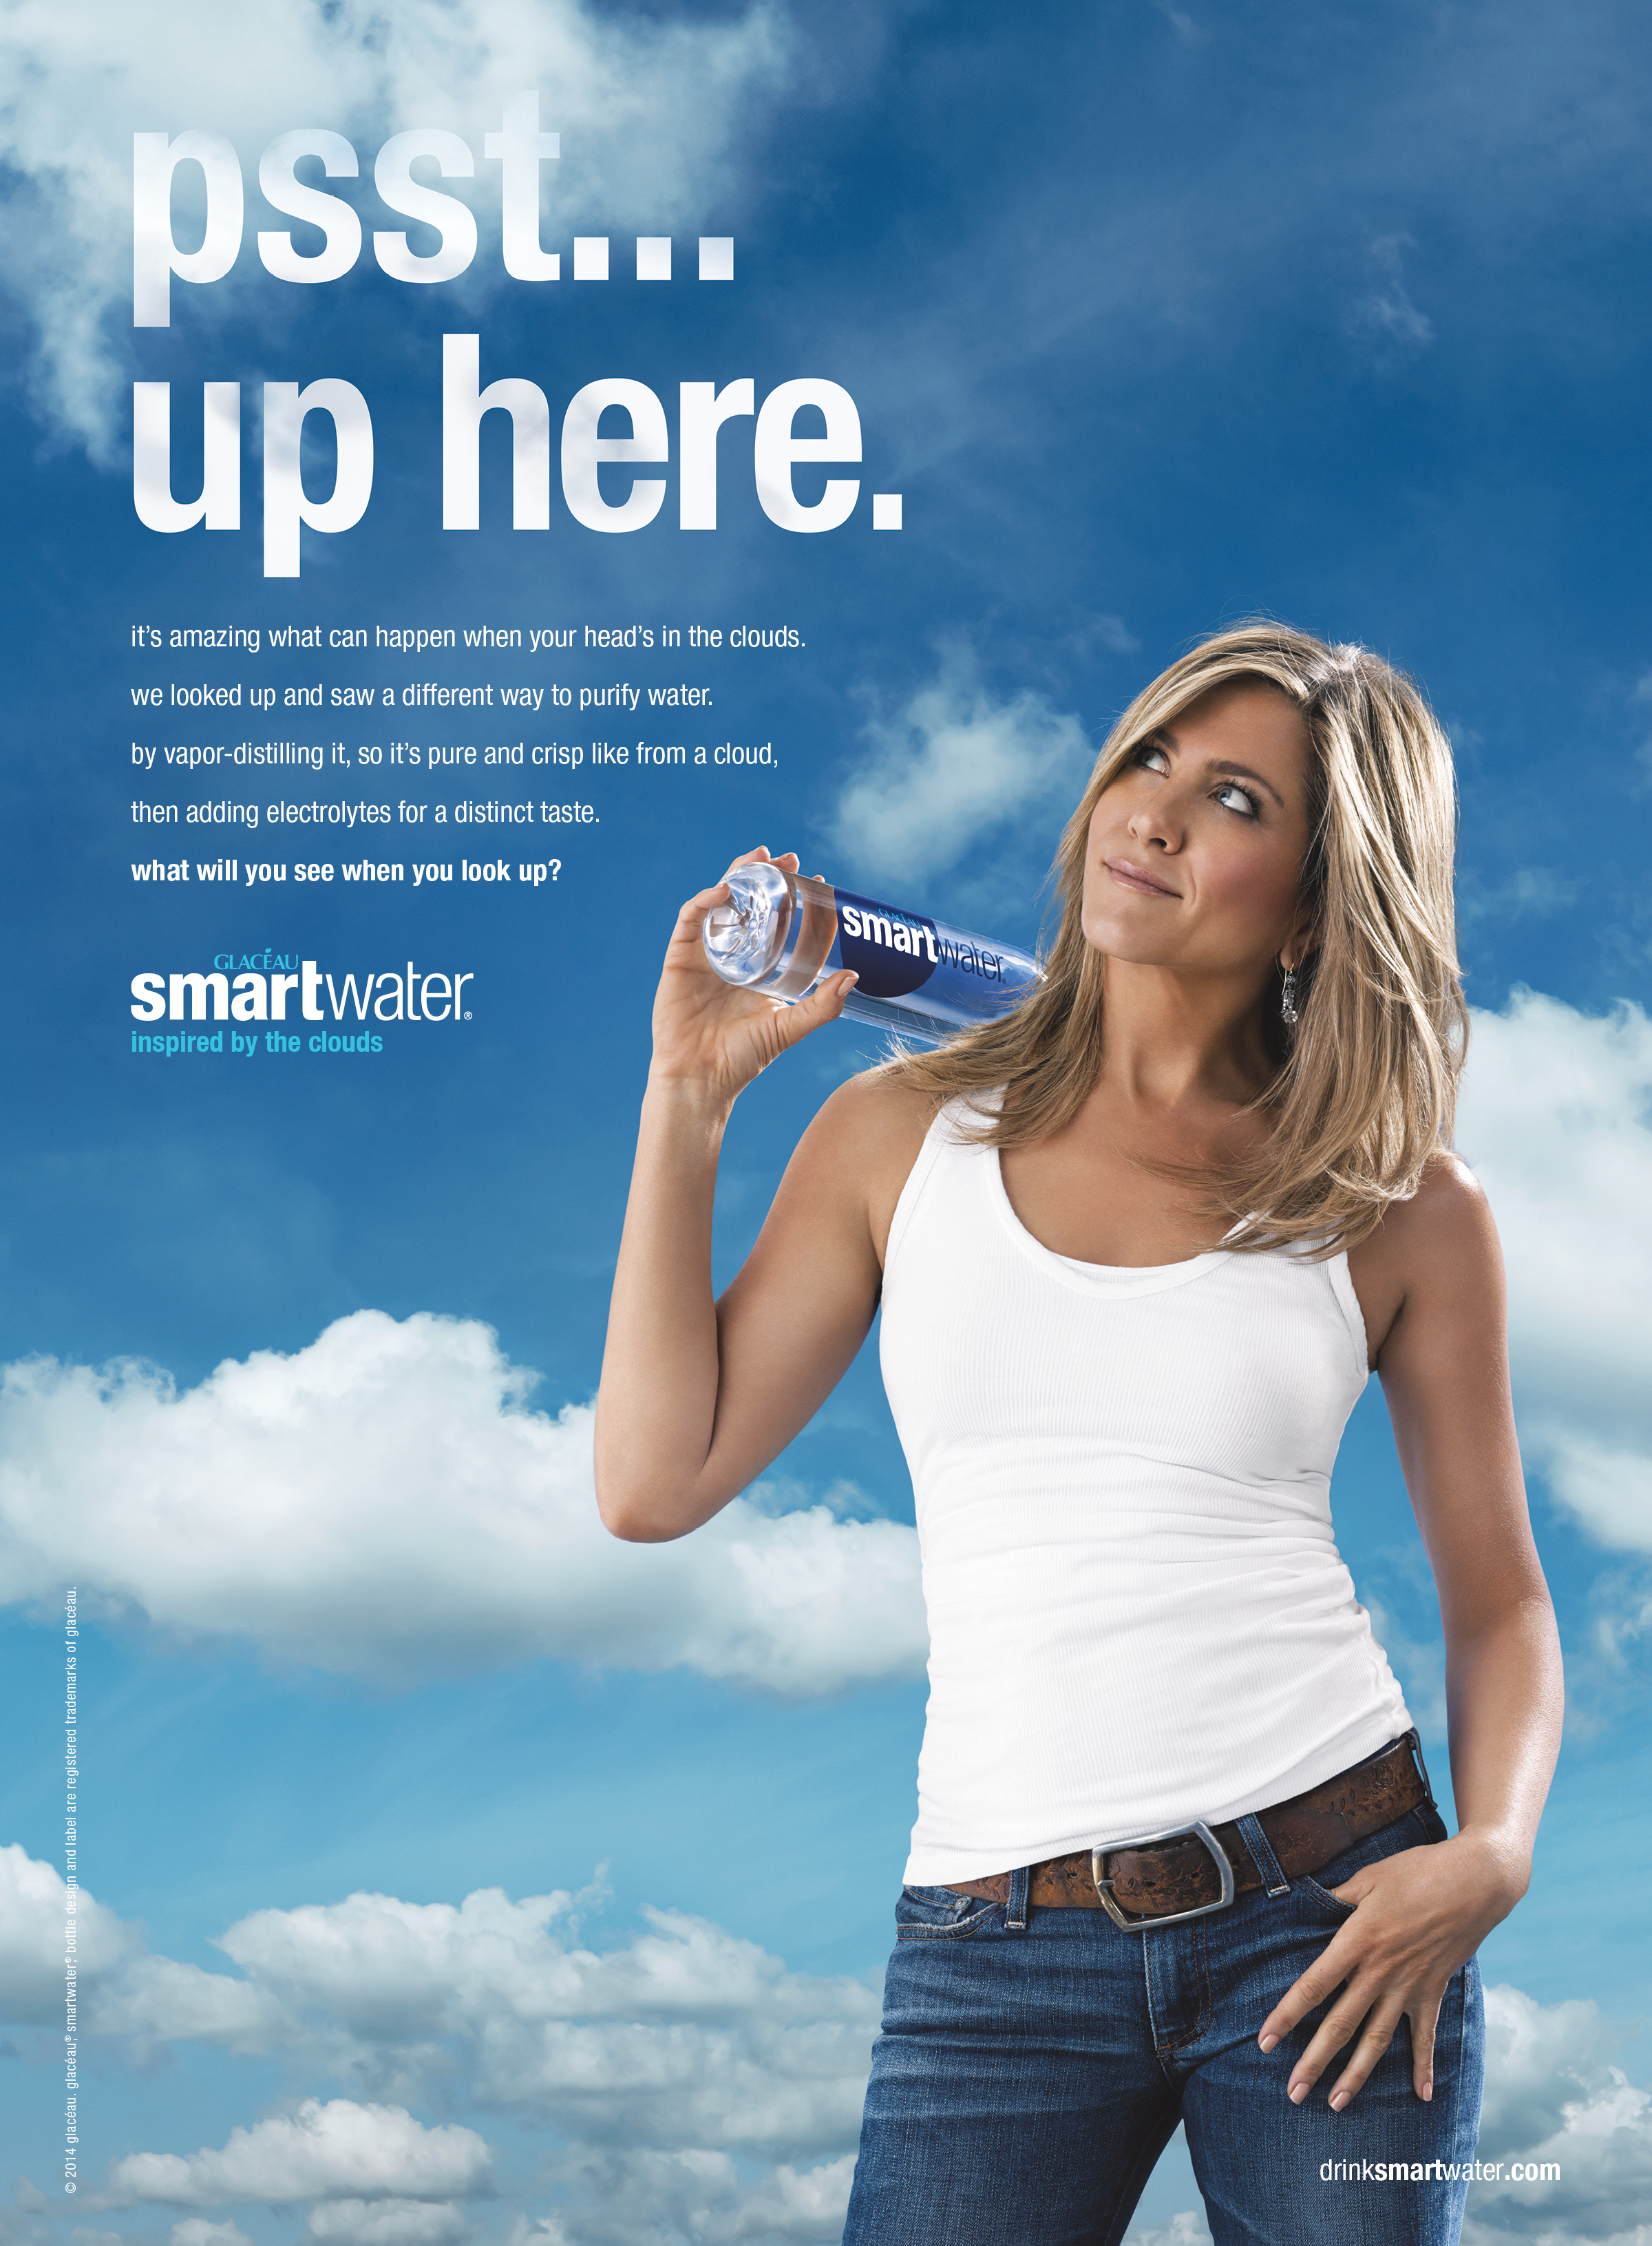 jennifer aniston smartwater